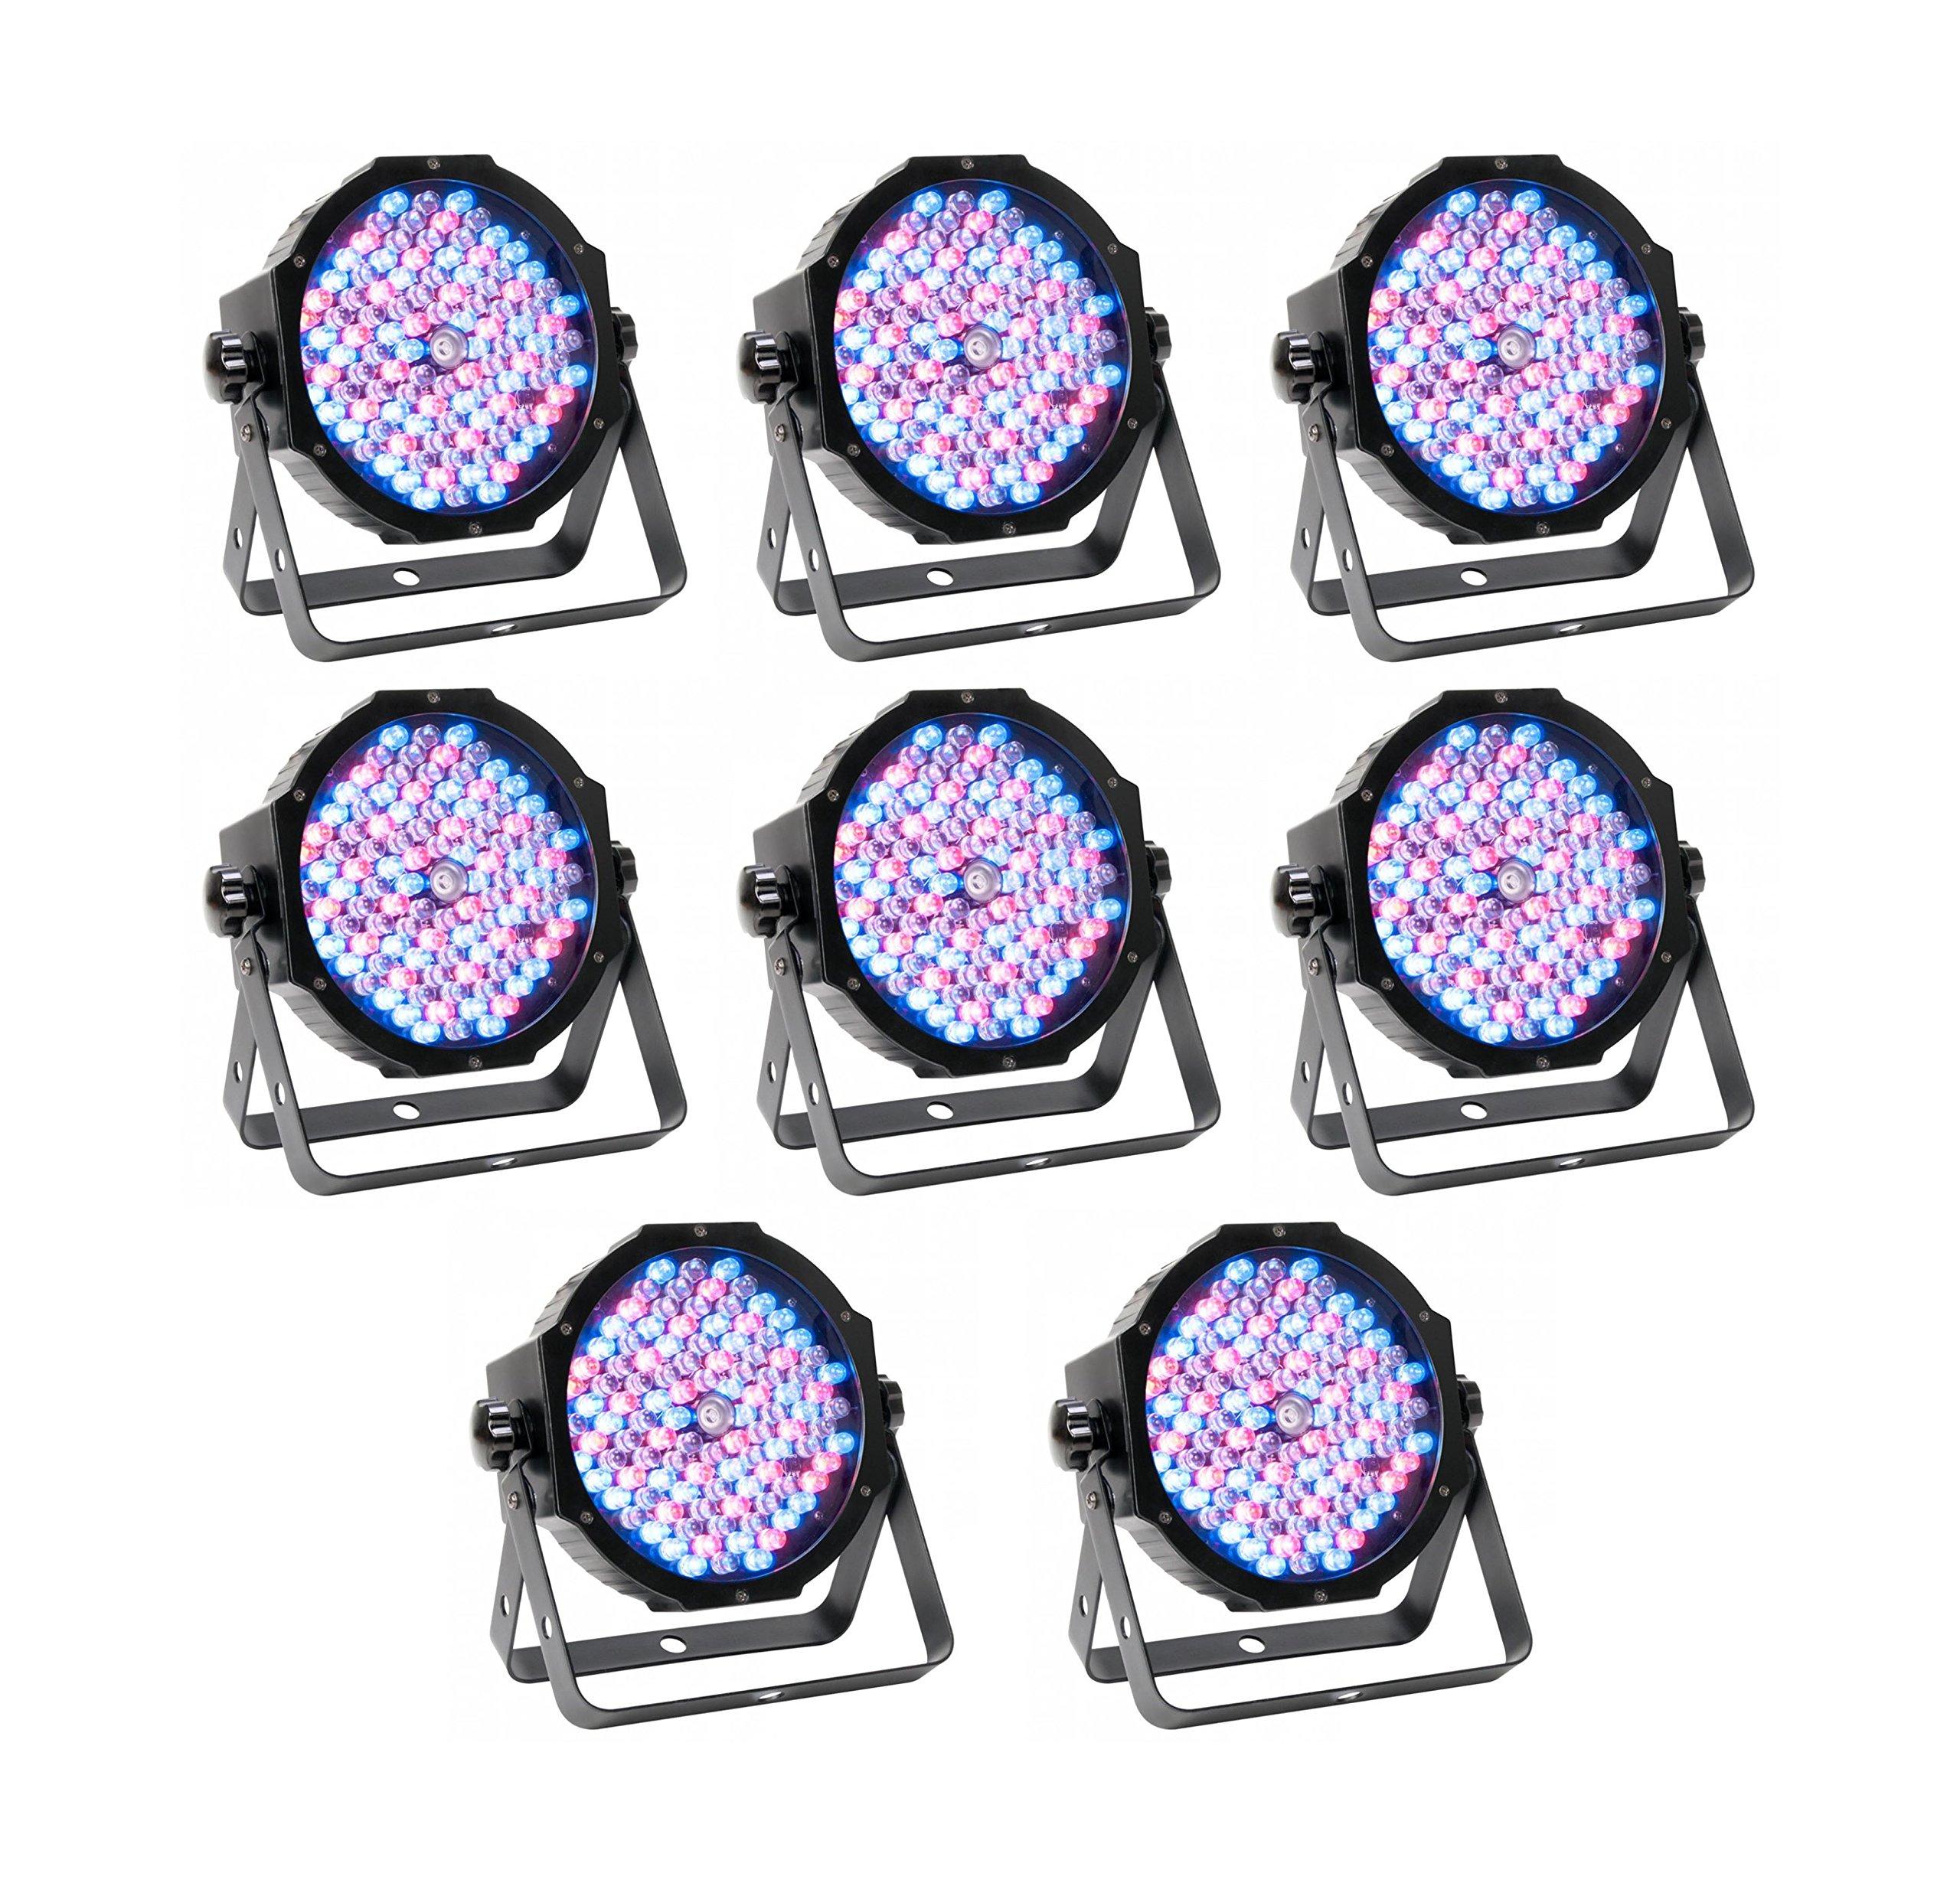 (8) American DJ Mega Par Low Profile Par Can Wash Lights